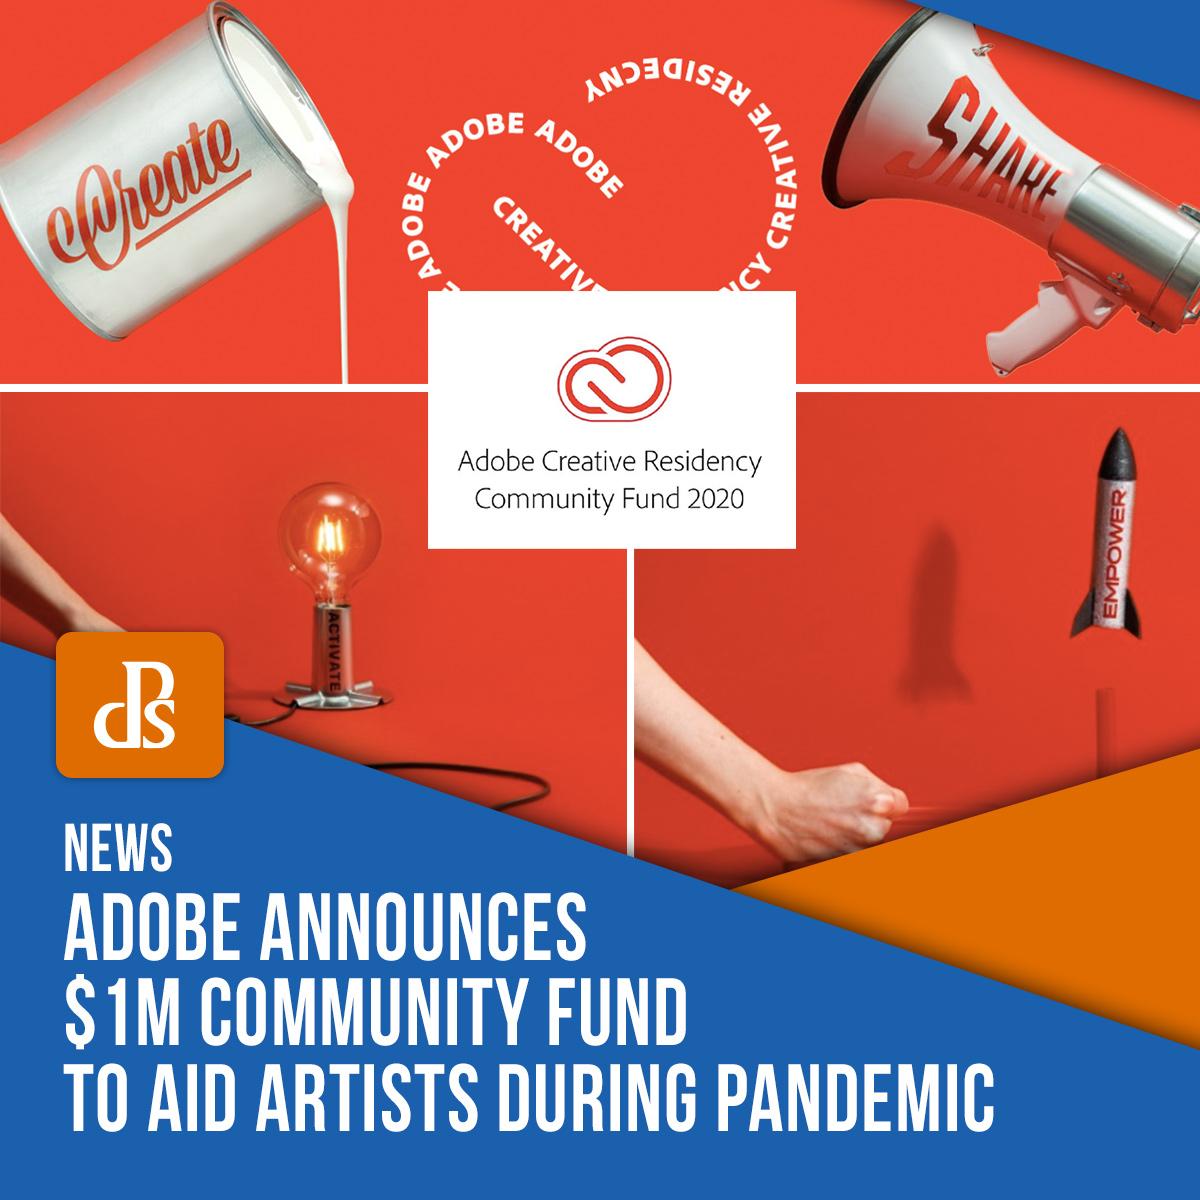 Adobe community fund creative residency